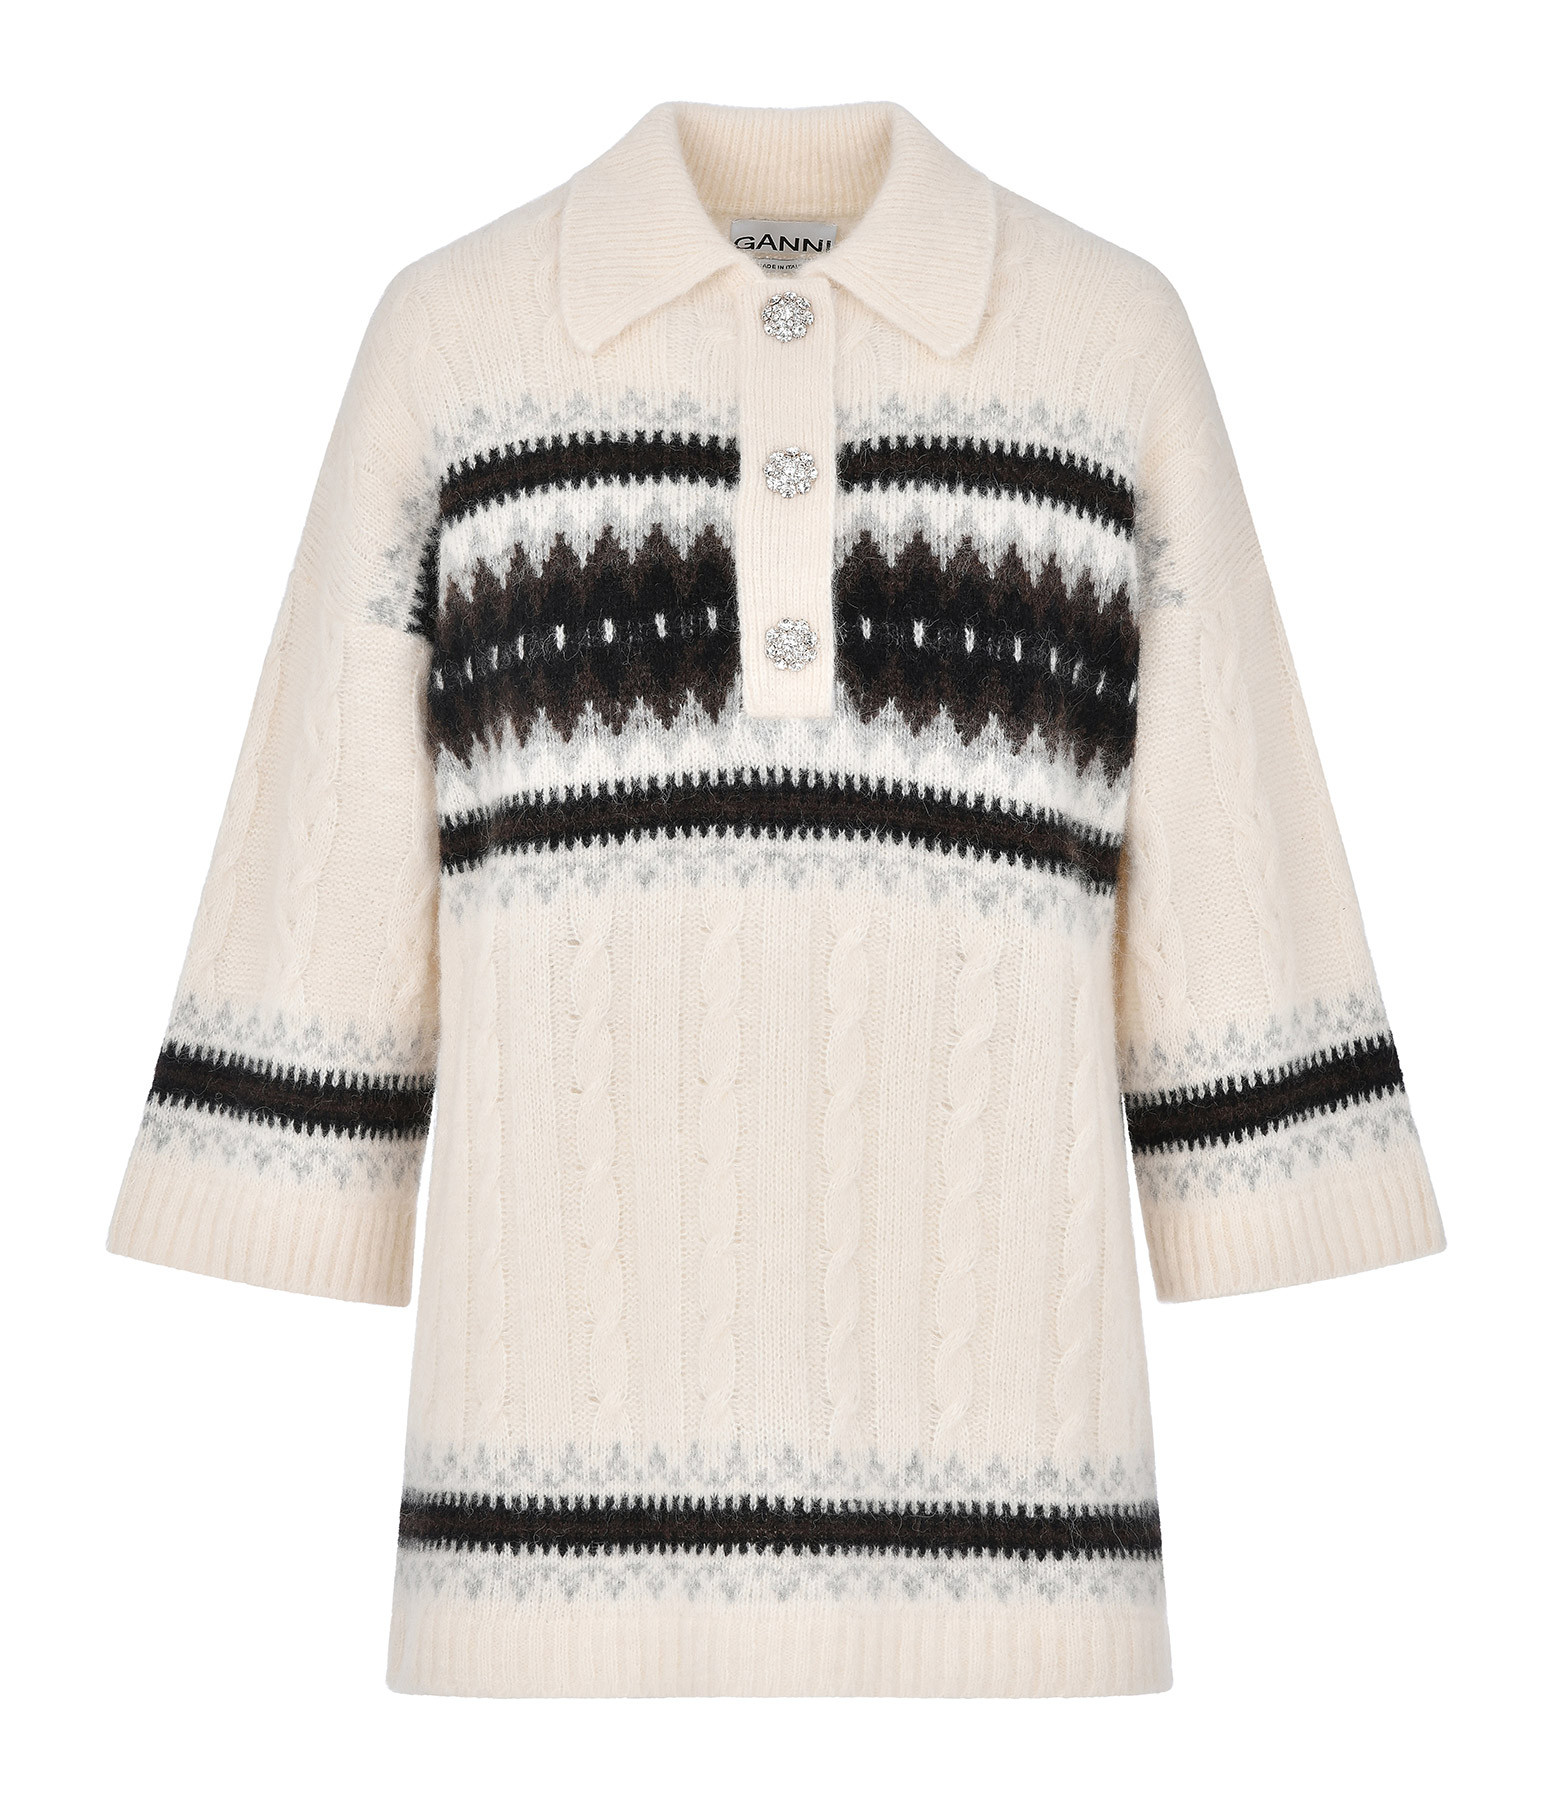 GANNI - Tee-shirt Alpaga Laine Blanc Beige